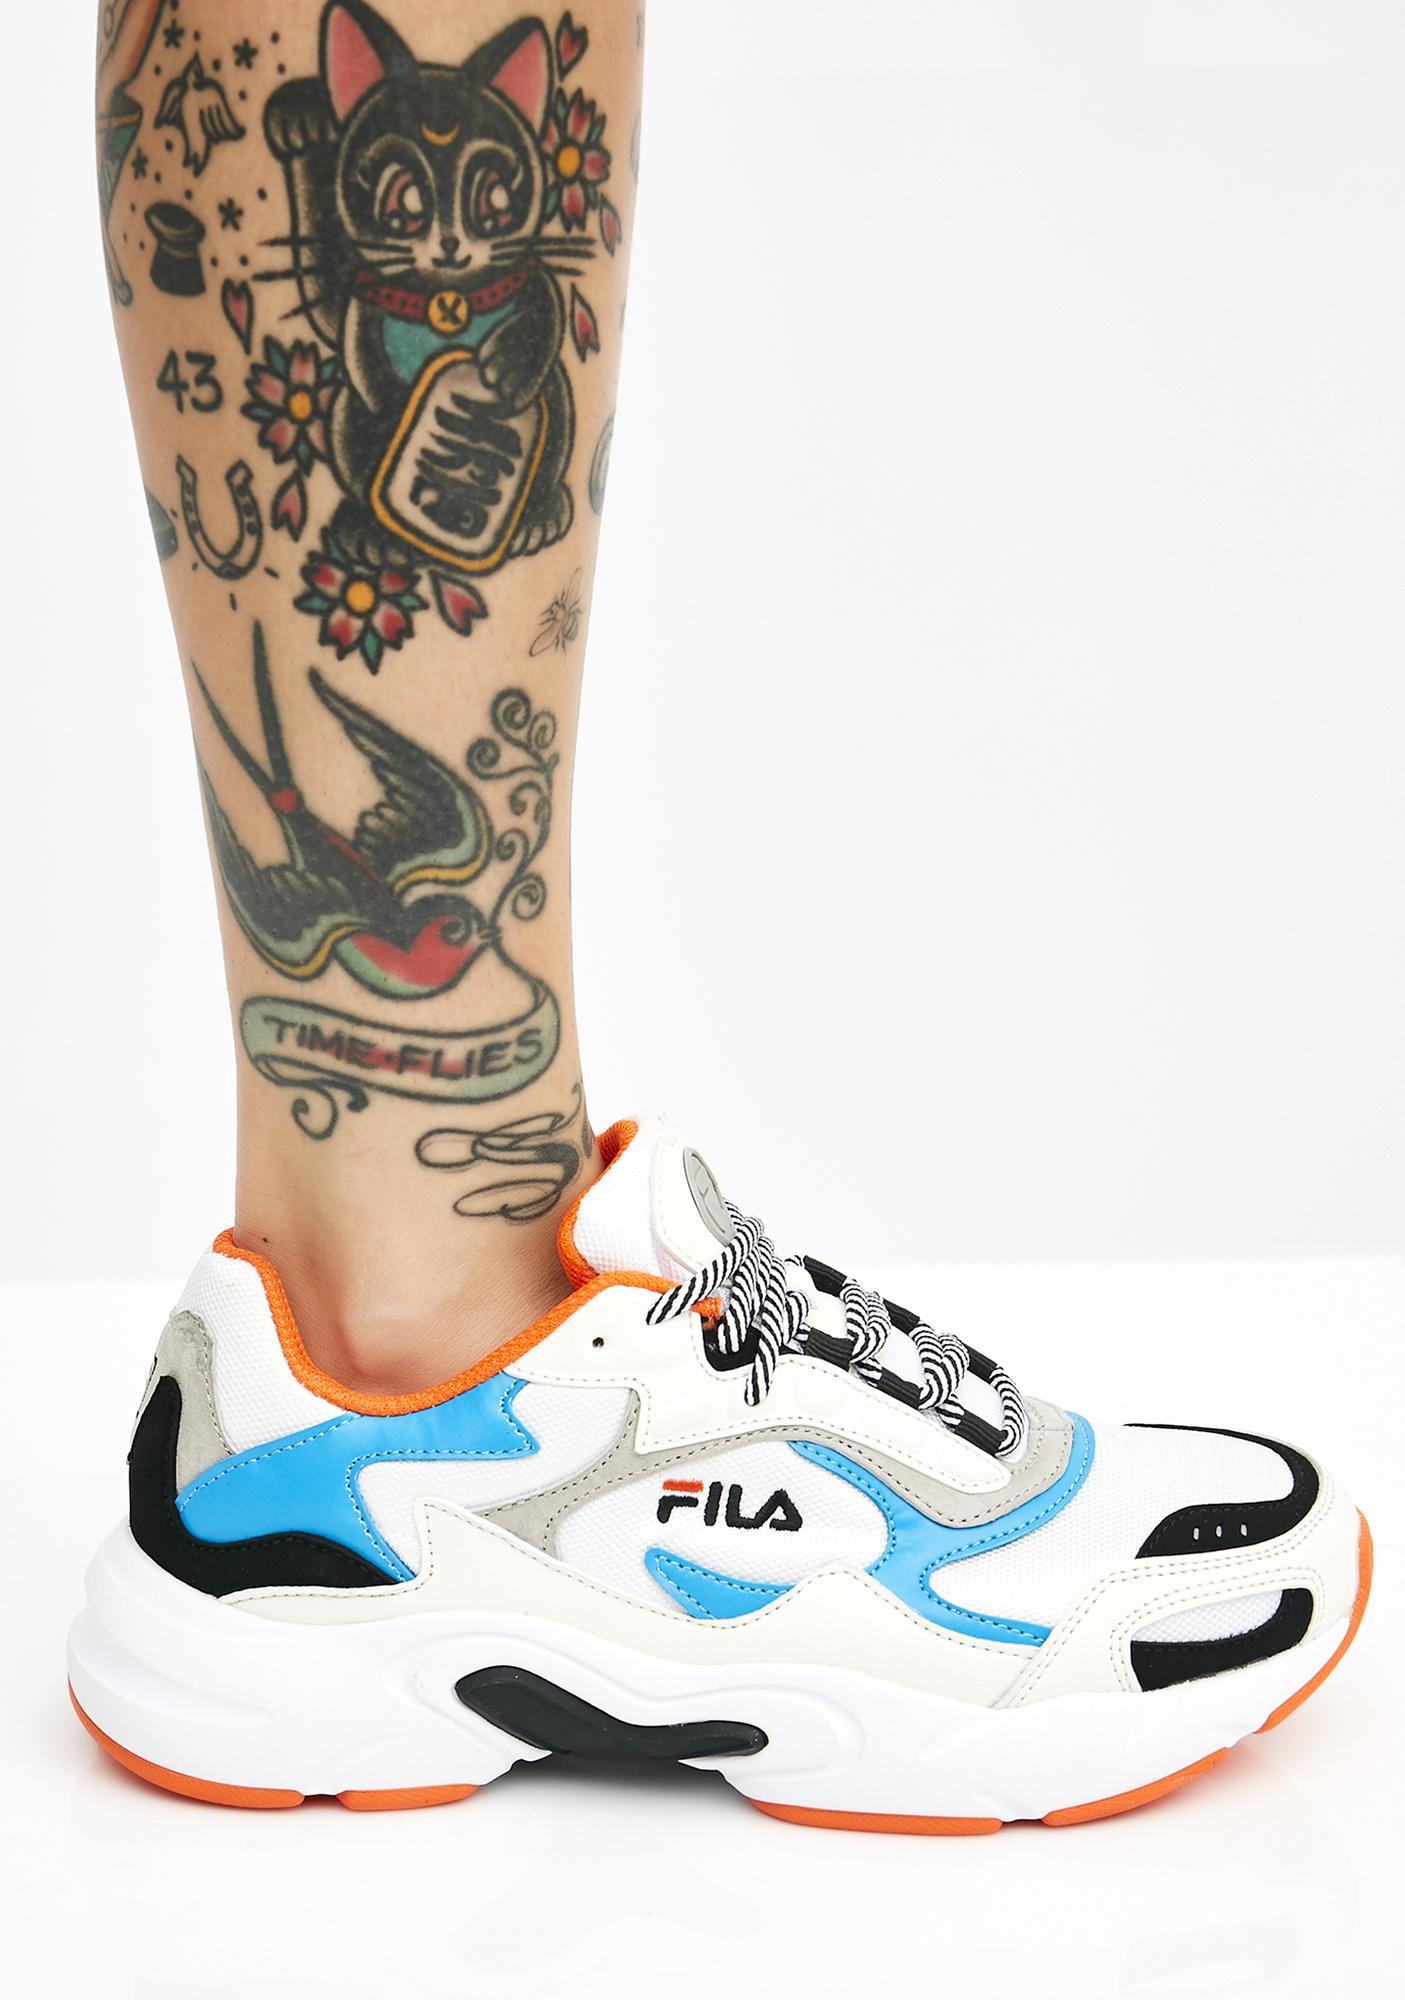 Fila Luminance Sneakers